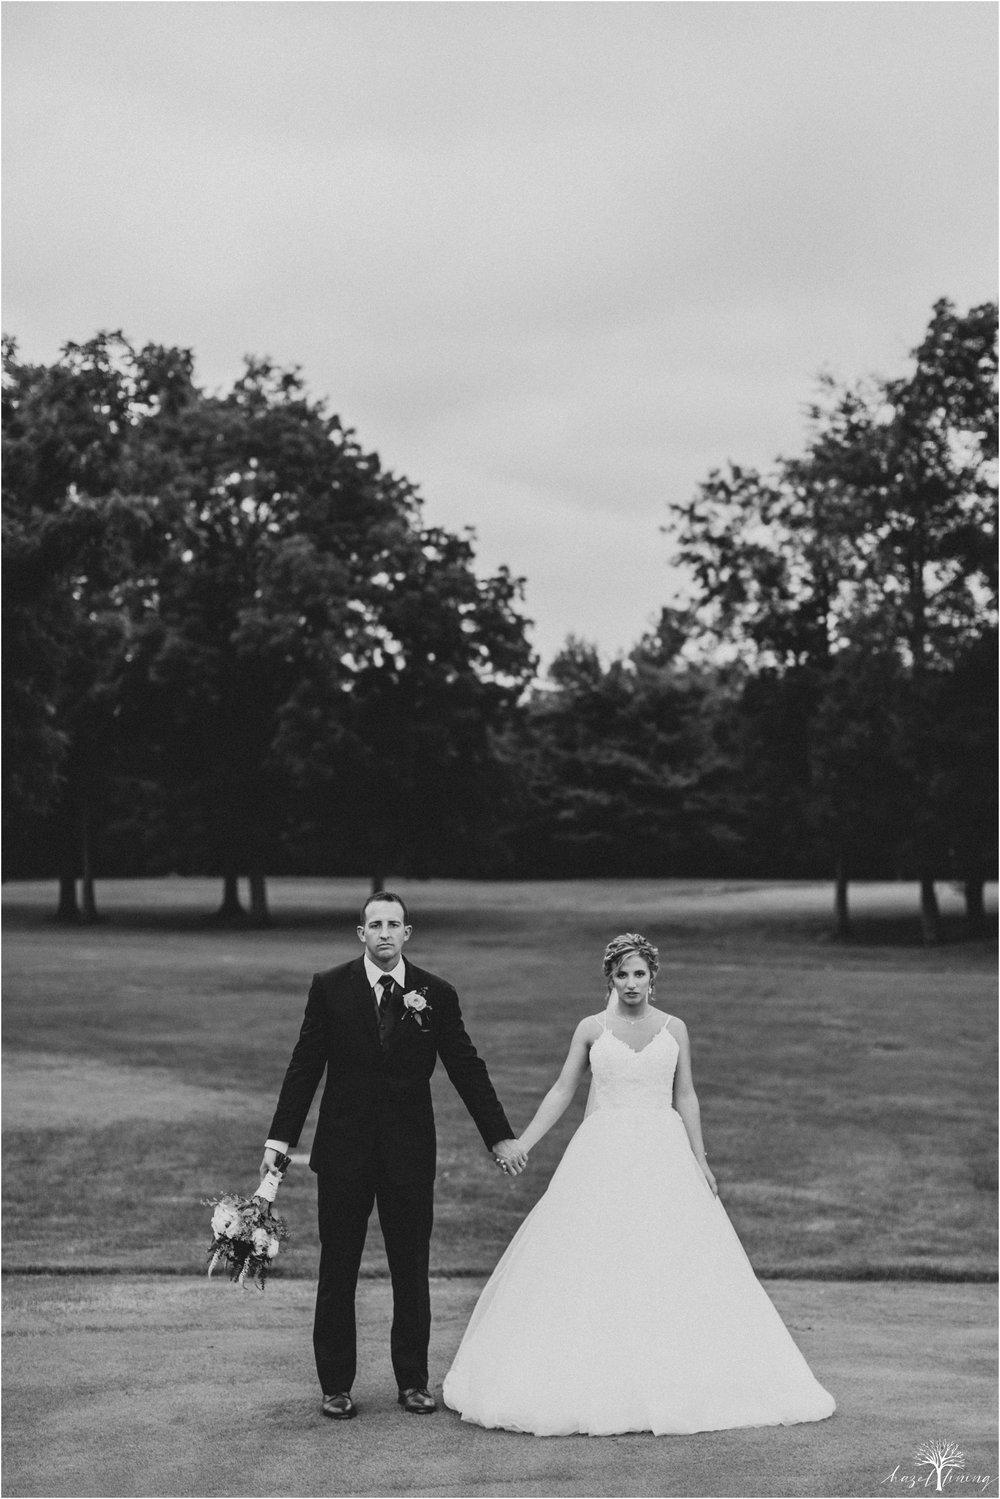 jonathan-weibel-becky-haywood-loft-at-sweetwater-cc-pennsburg-pennsylvania-rainy-day-summer-wedding-hazel-lining-travel-wedding-elopement-photography_0098.jpg